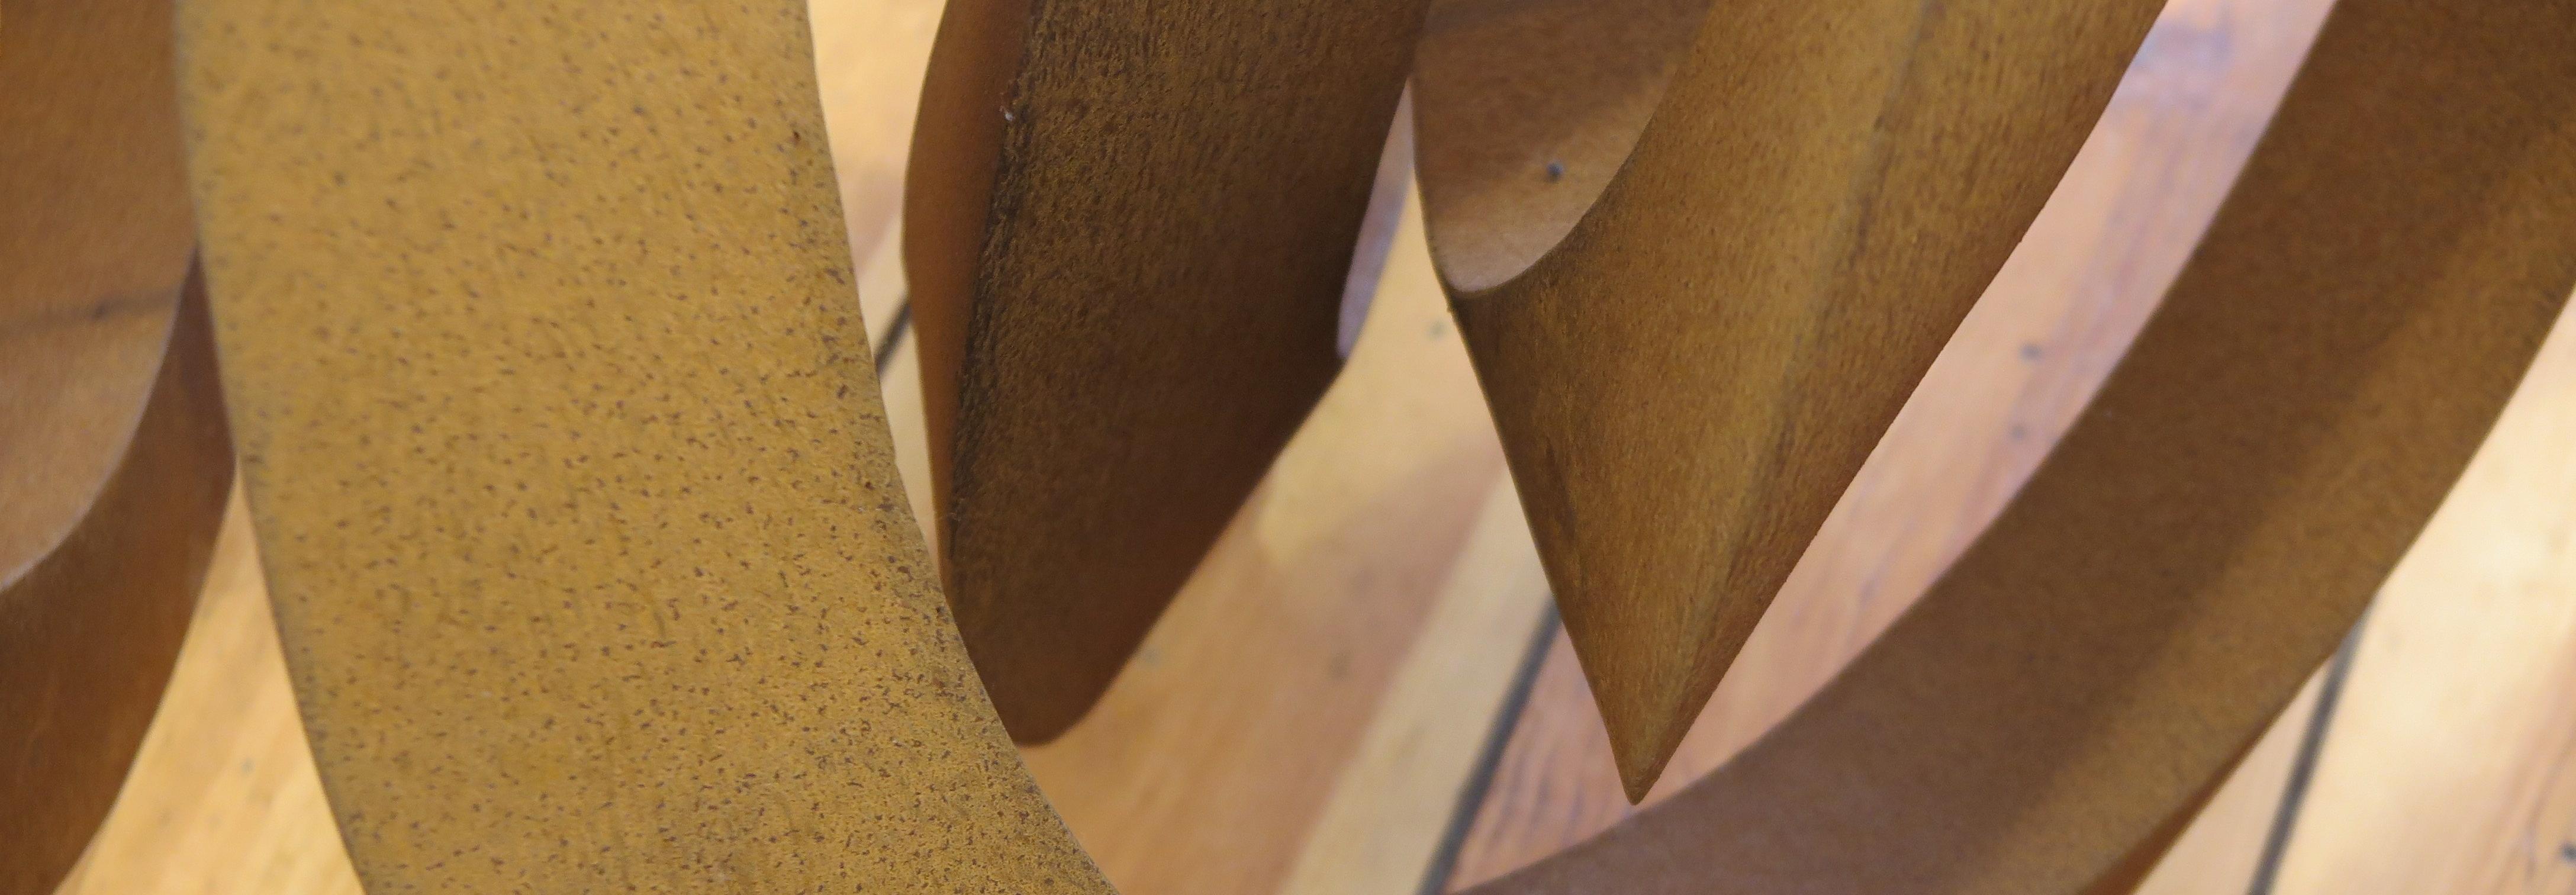 Pieter Obels - detail van werk